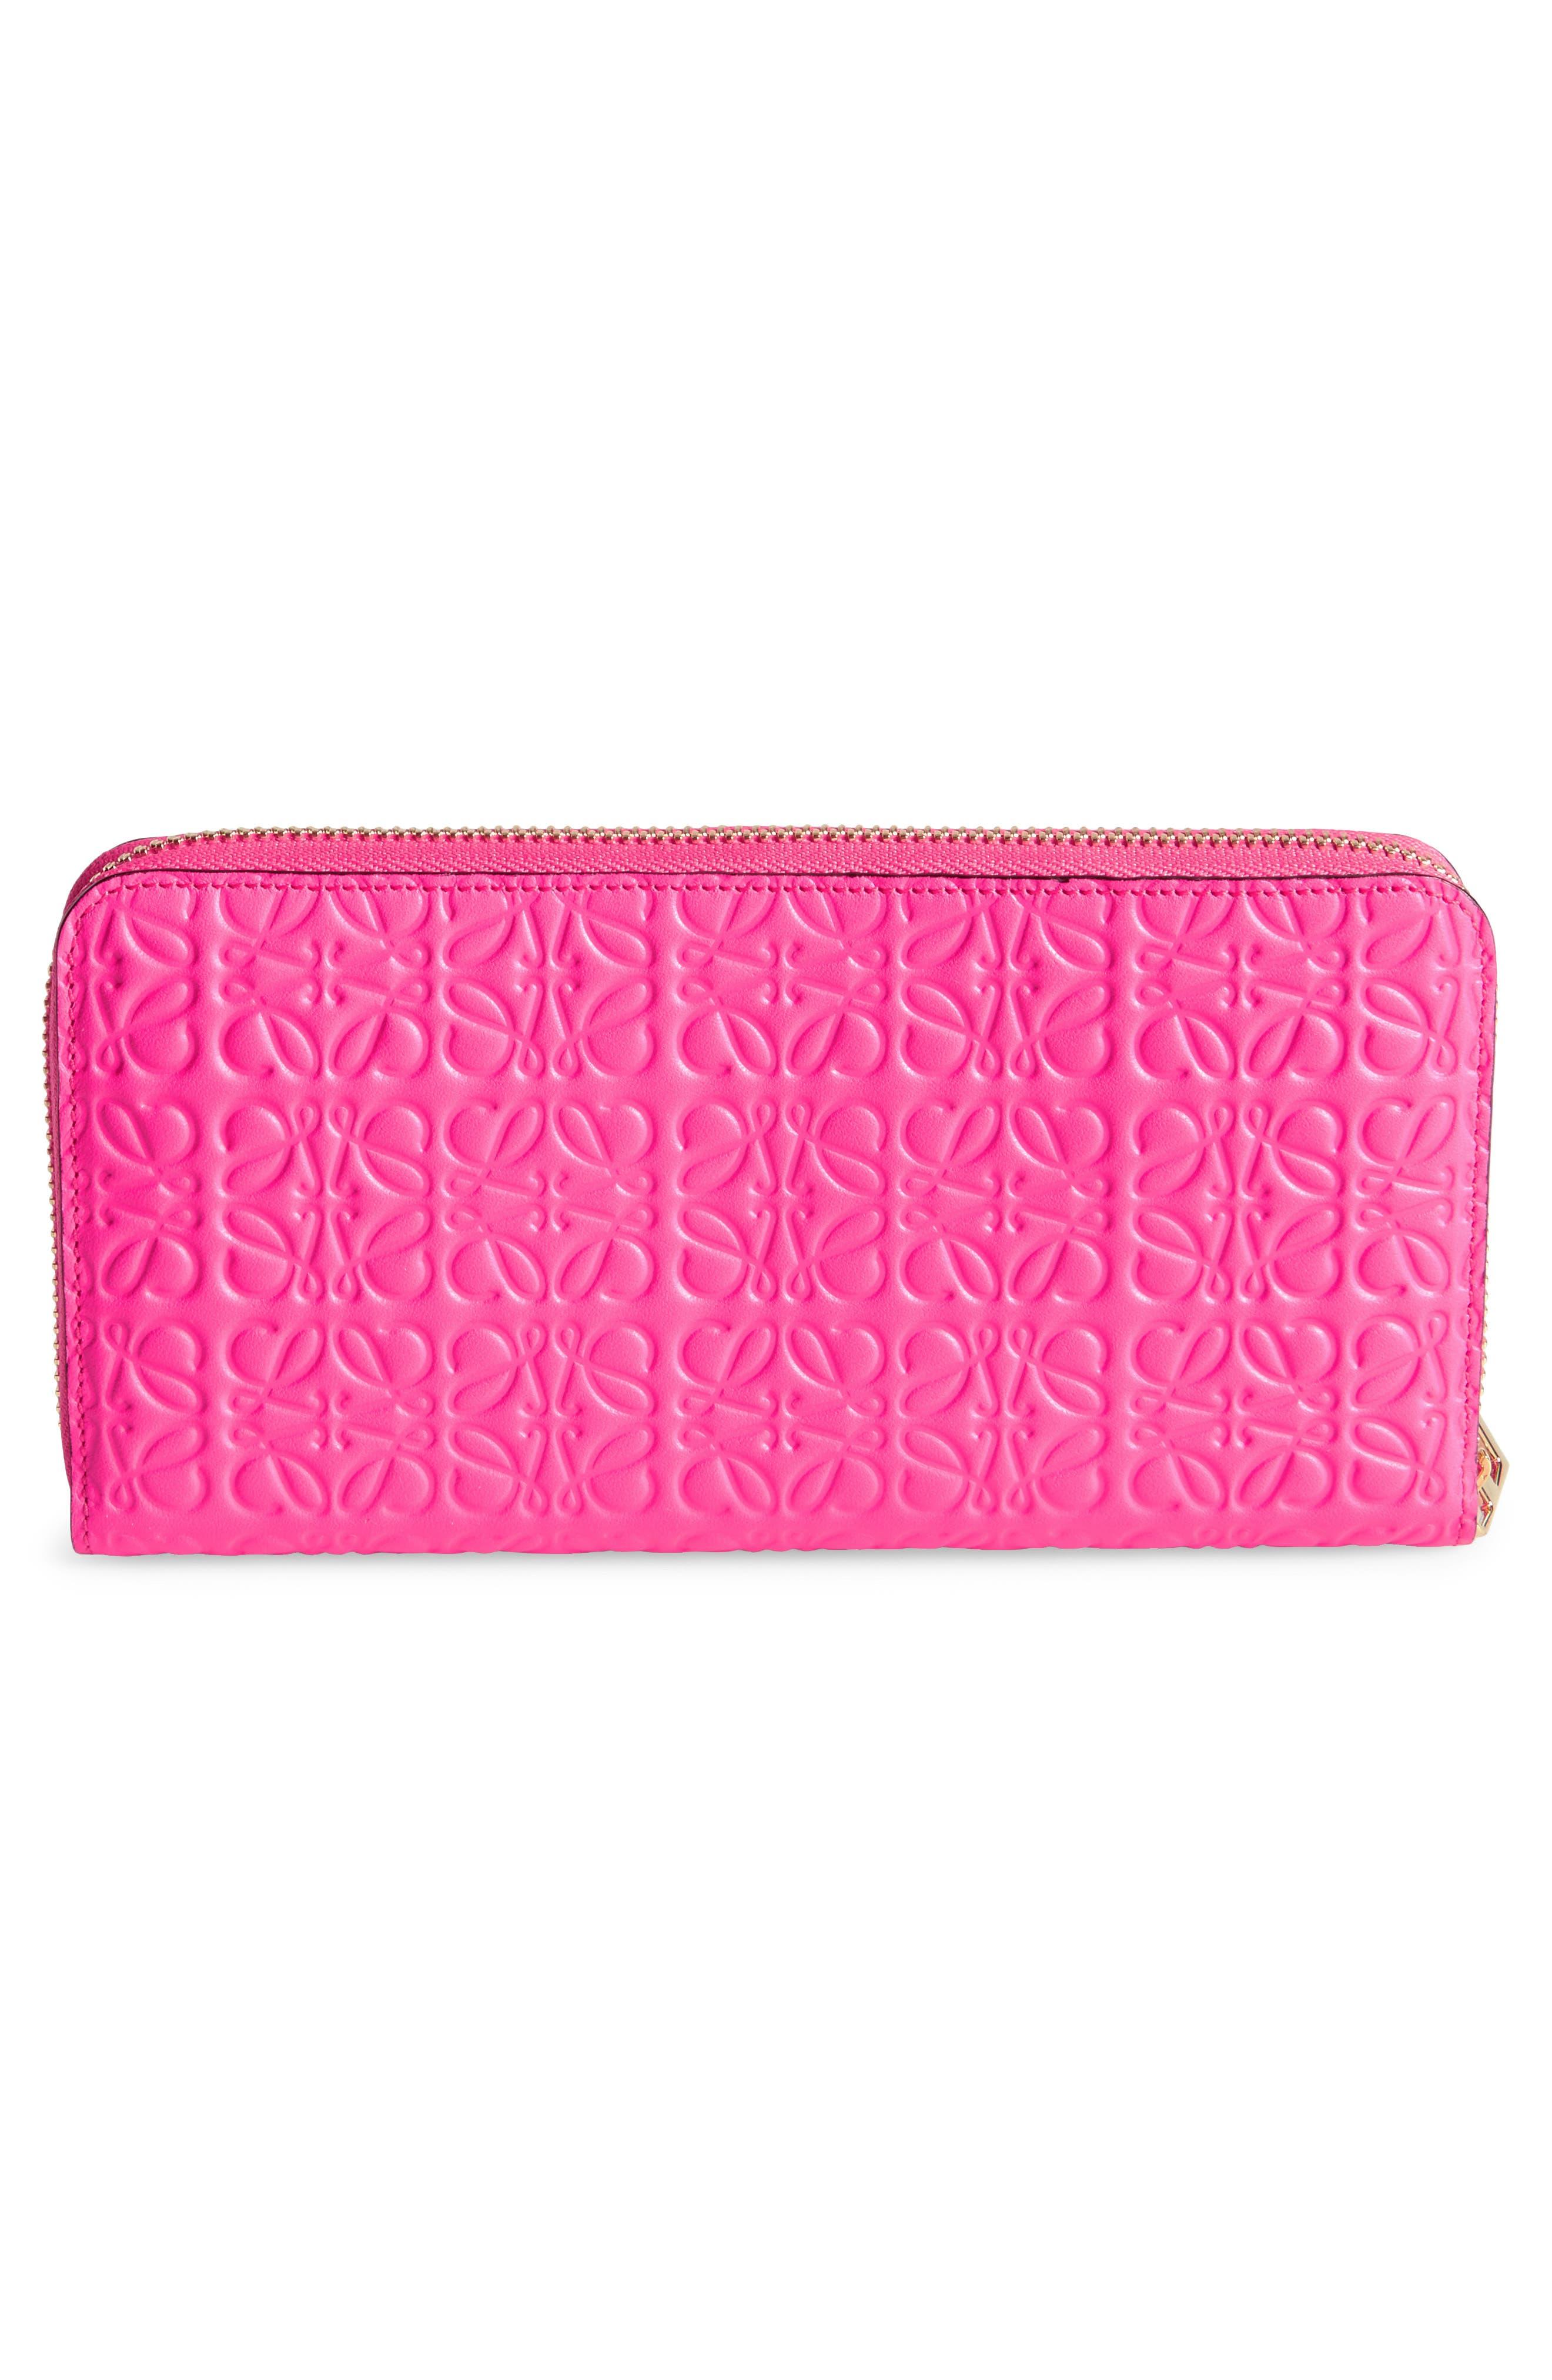 Leather Zip Around Wallet,                             Alternate thumbnail 4, color,                             Shocking Pink